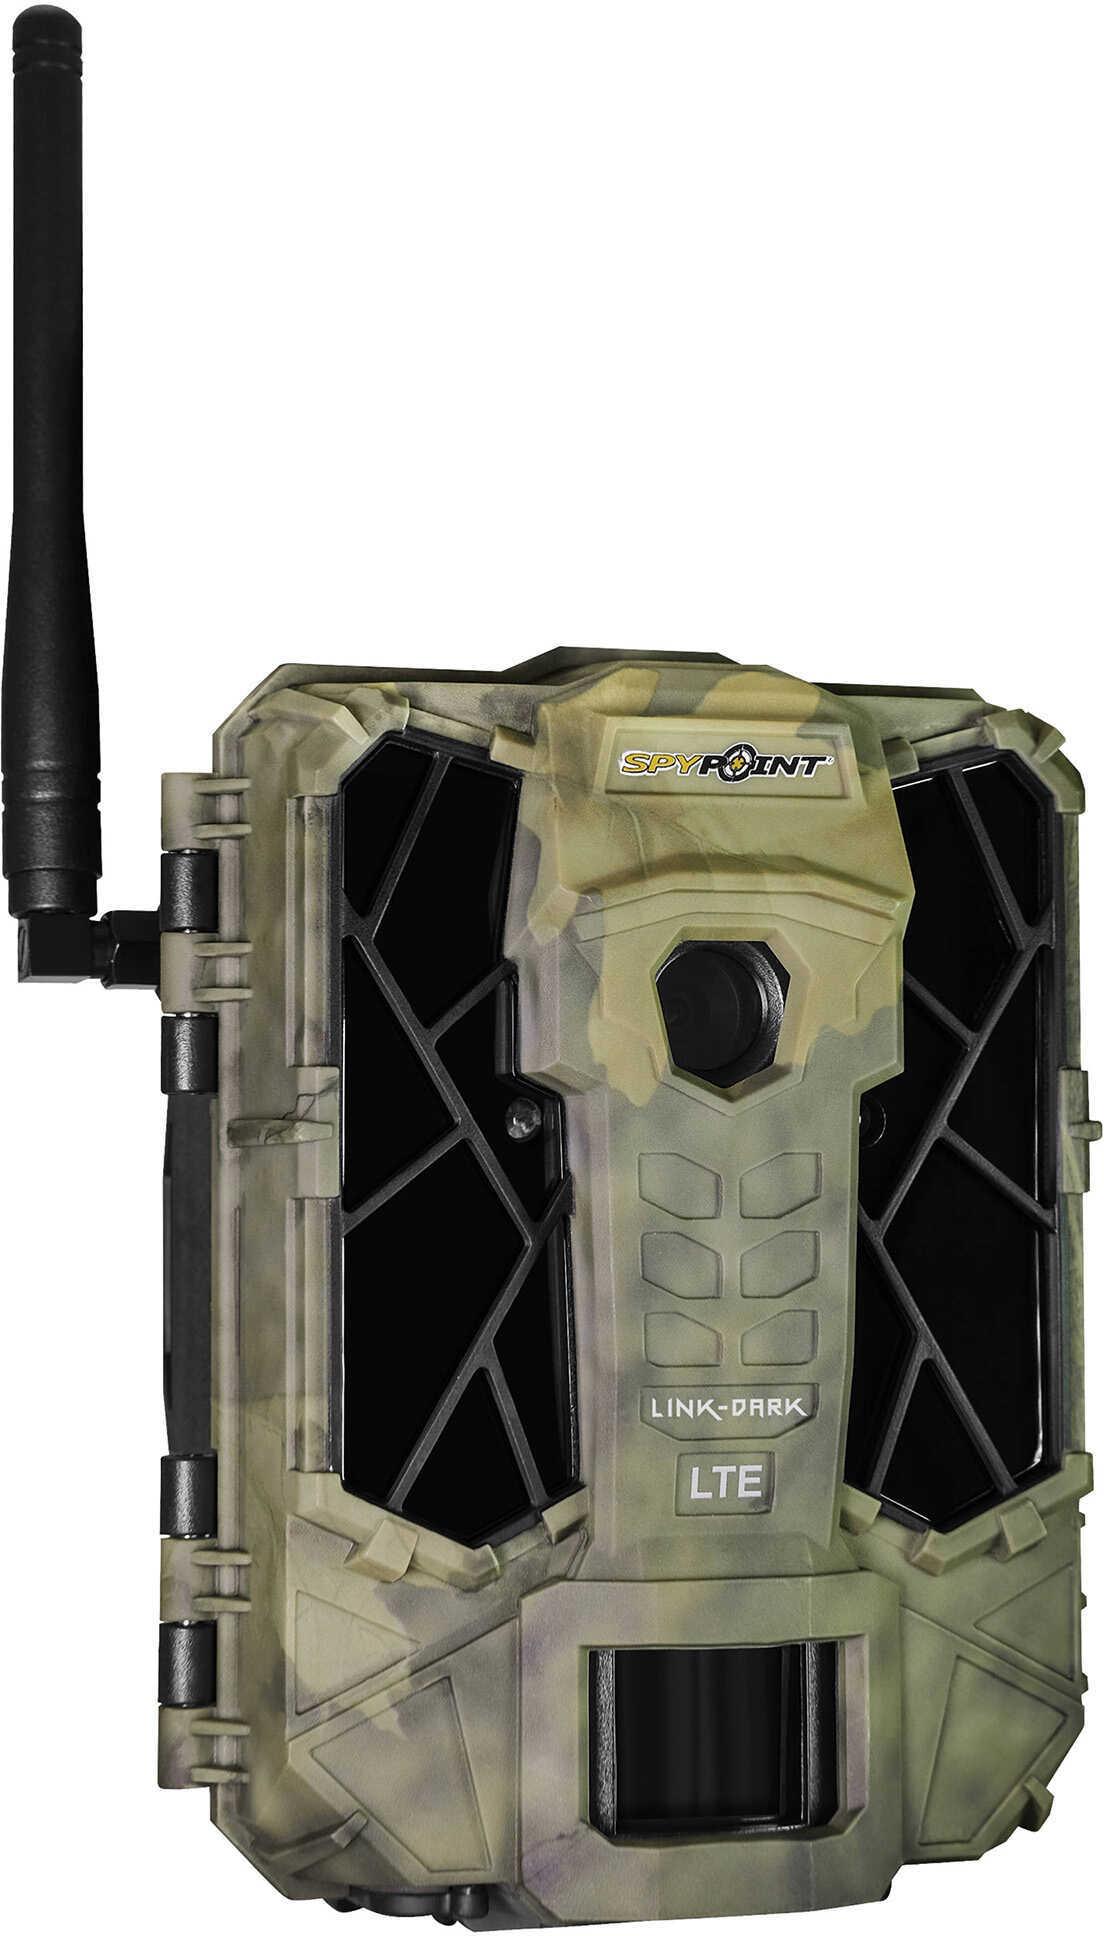 Spypoint Link Dark Verizon Cellular Trail Camera Model: LINKDARKVERIZON